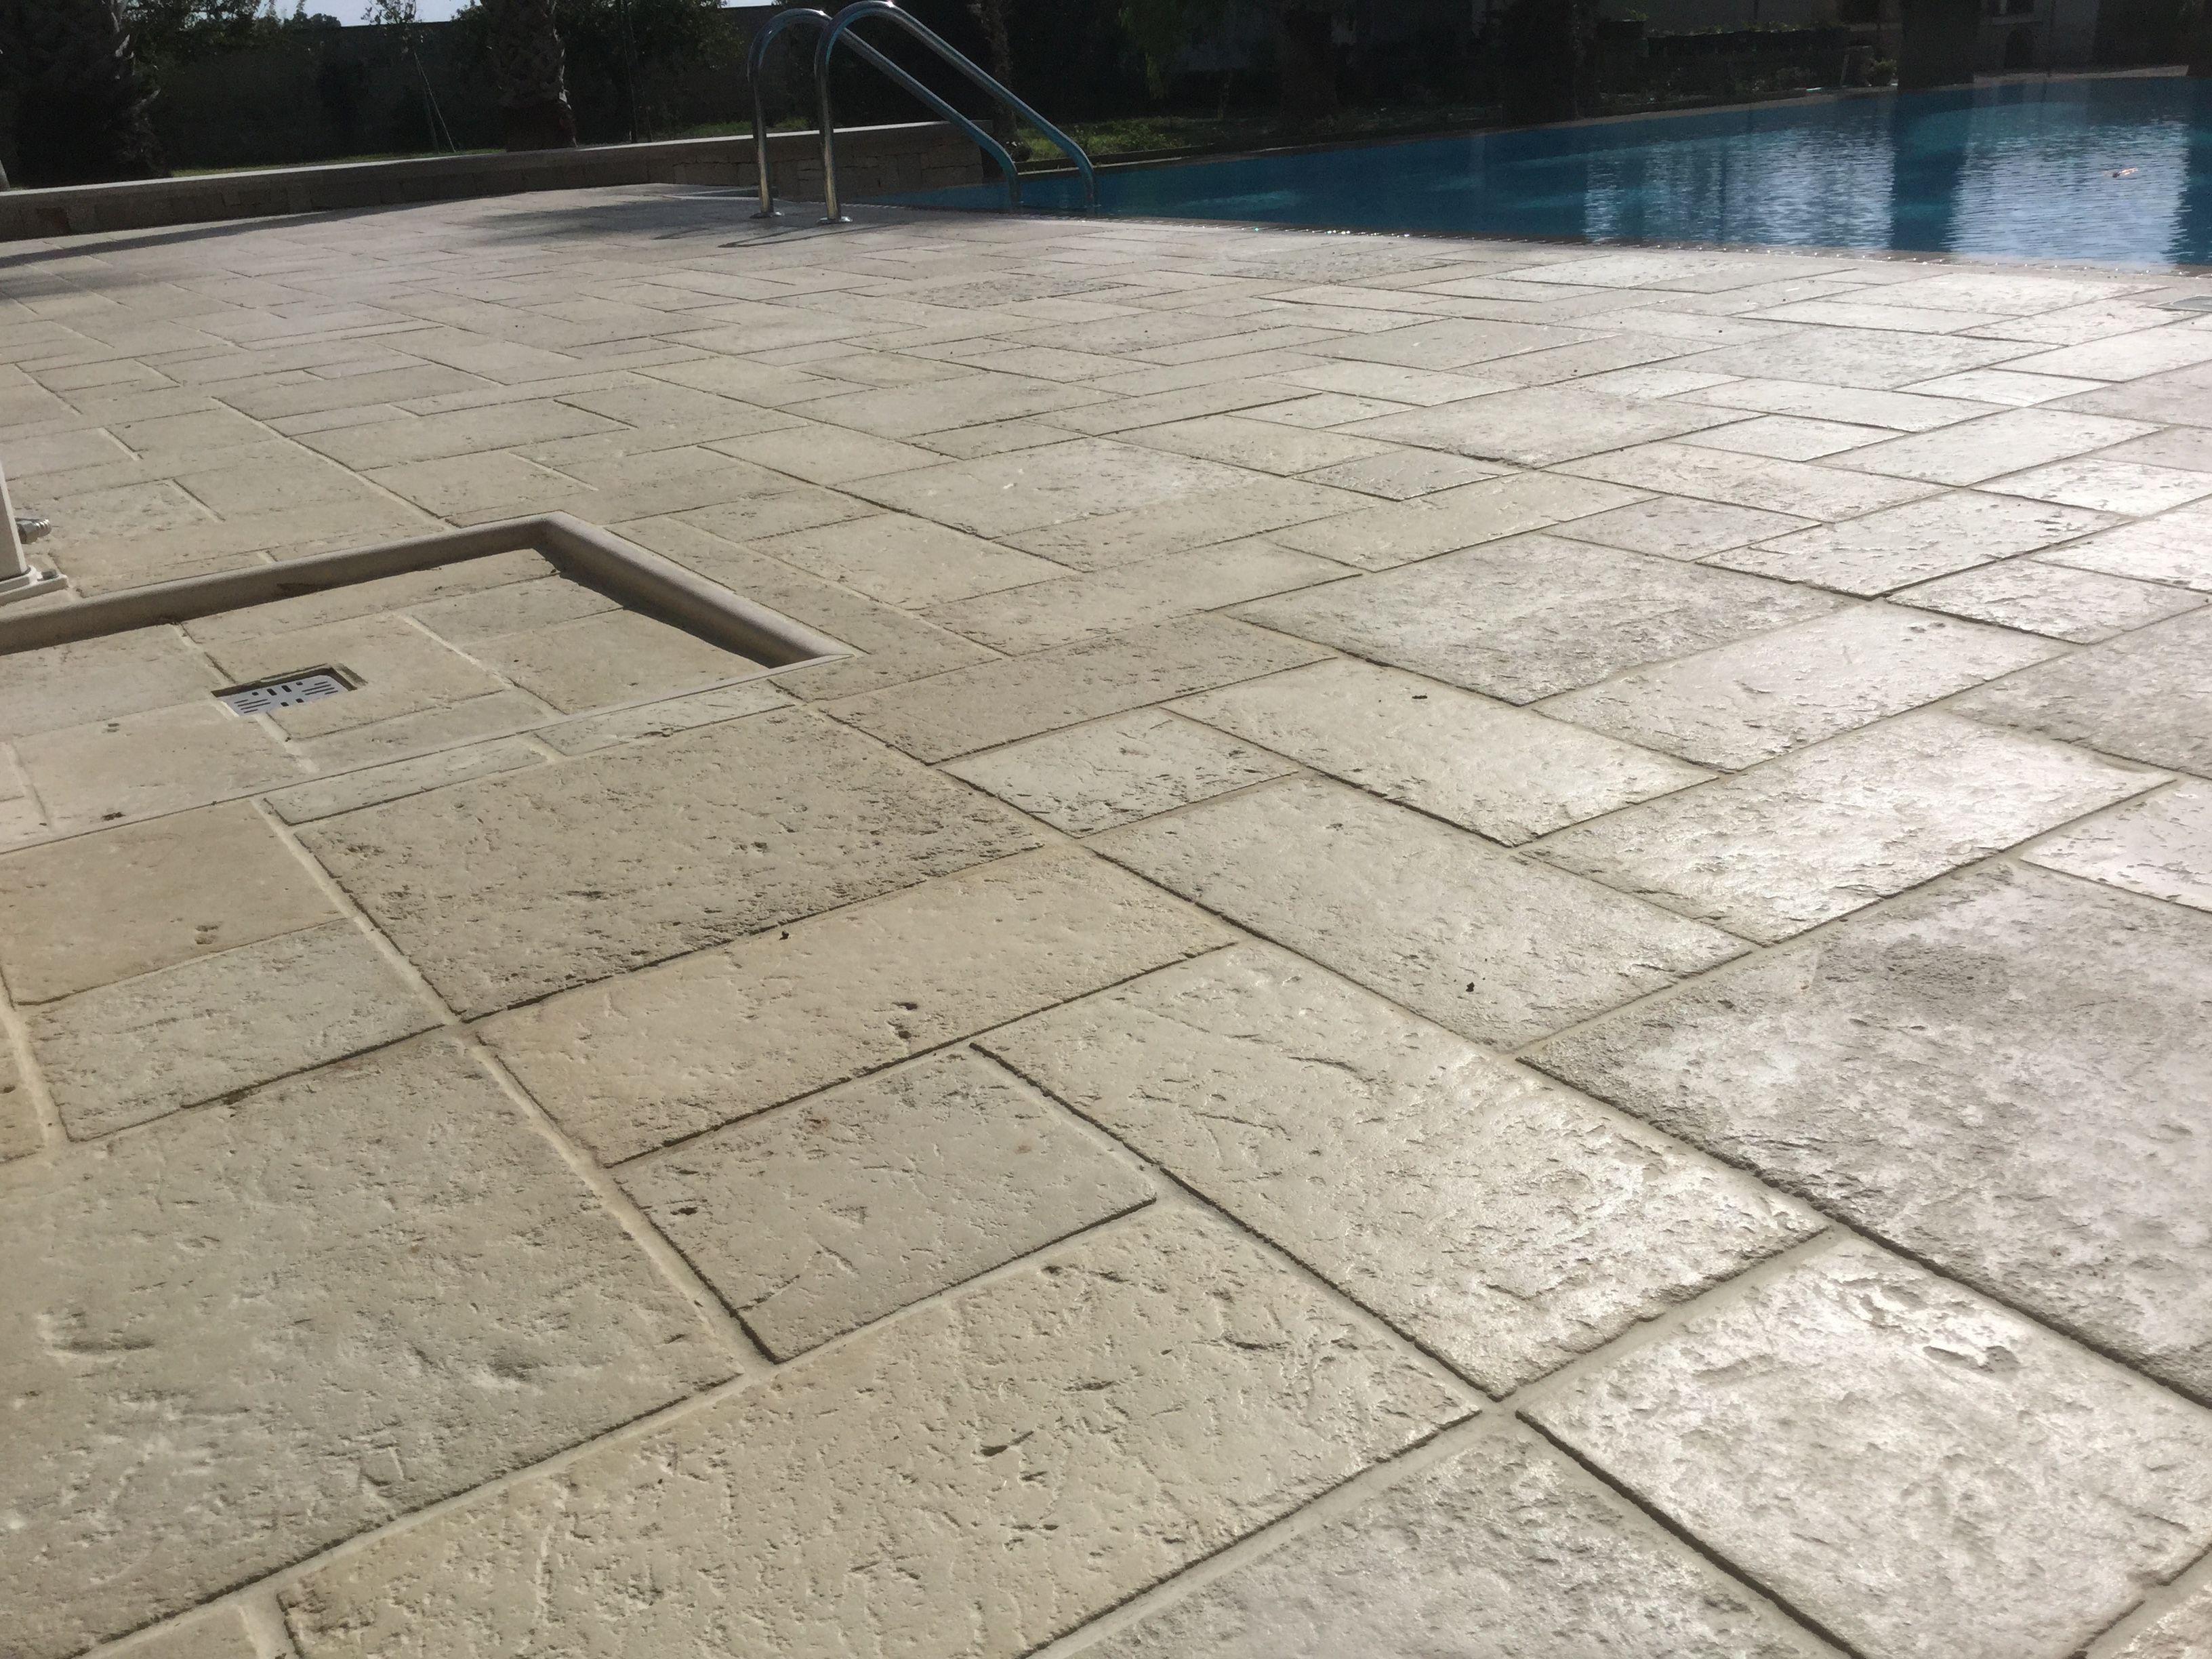 Best pavimenti on line ideas - Piastrelle per piscina ...